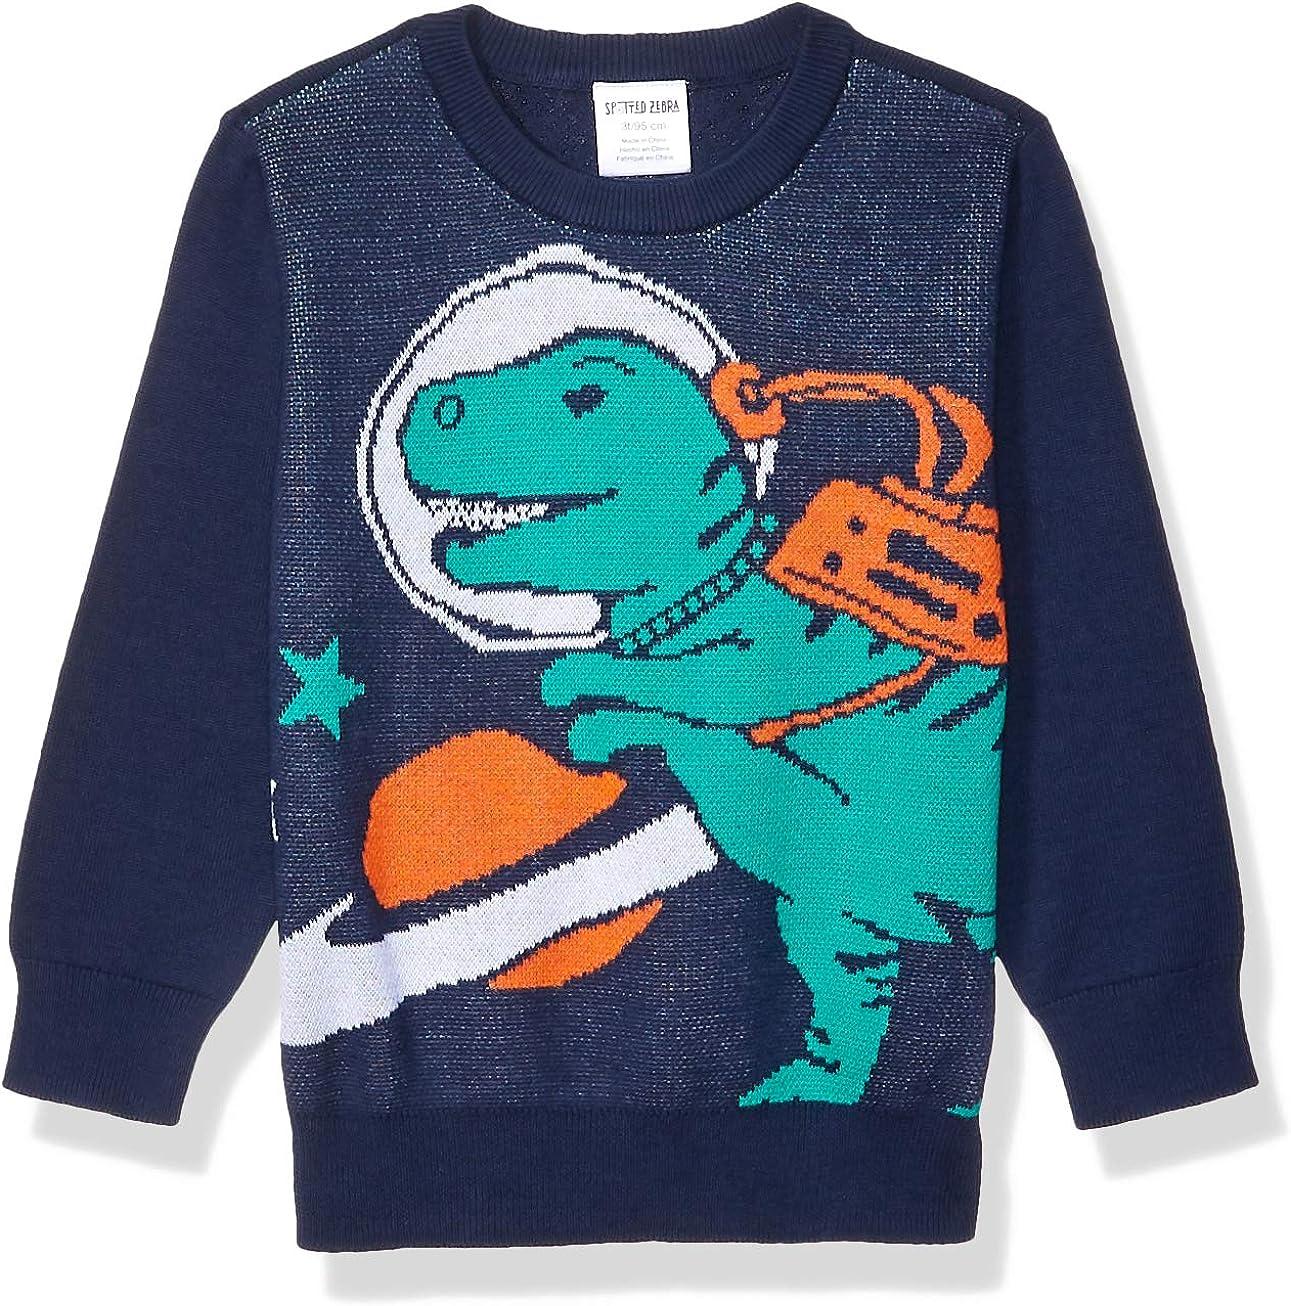 Amazon Brand - Spotted Zebra Boys' Pullover Crew Sweaters